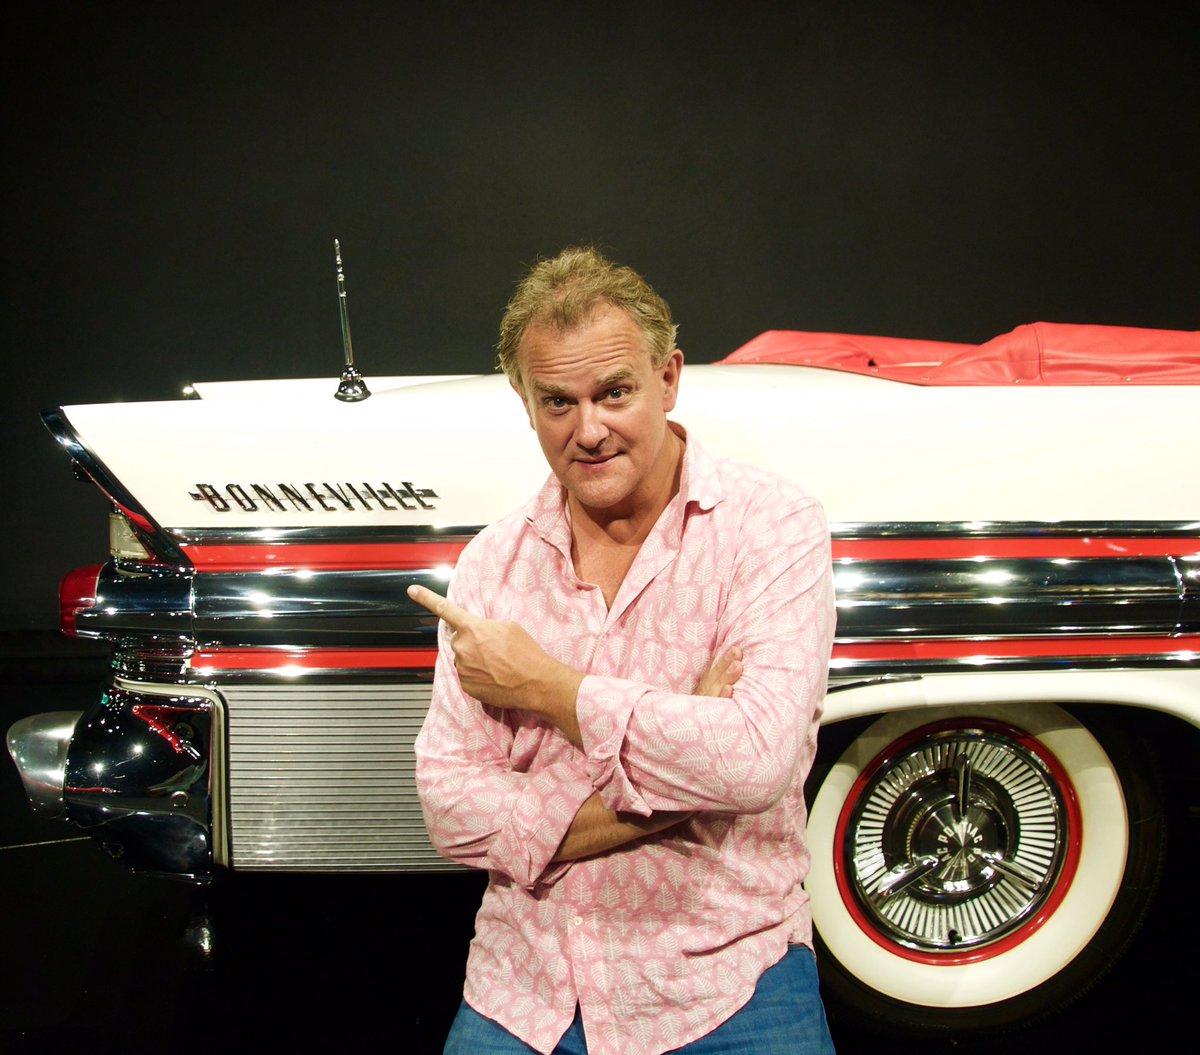 After 52 years I finally get to meet my namesake #pontiac. Car by #bonneville, shirt by @indigoisland99 (HB) https://t.co/eLjnIwQolF